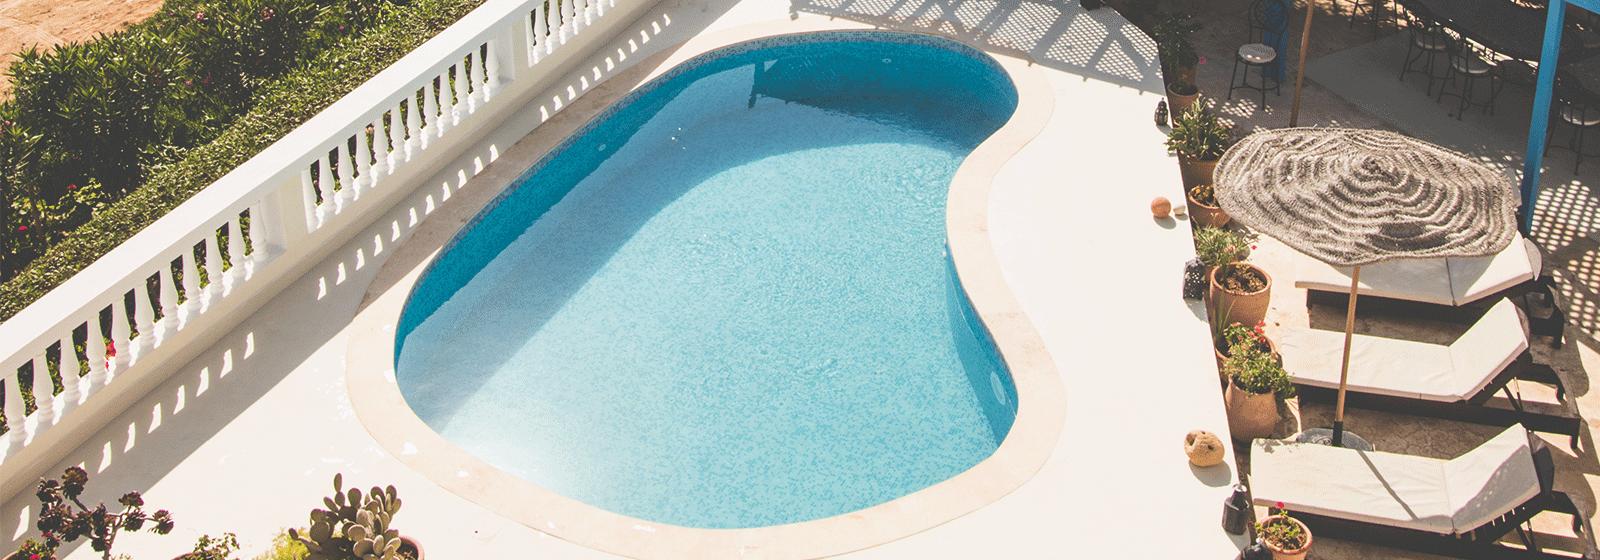 morocco-yoga-retreat-swimming-pool.jpg